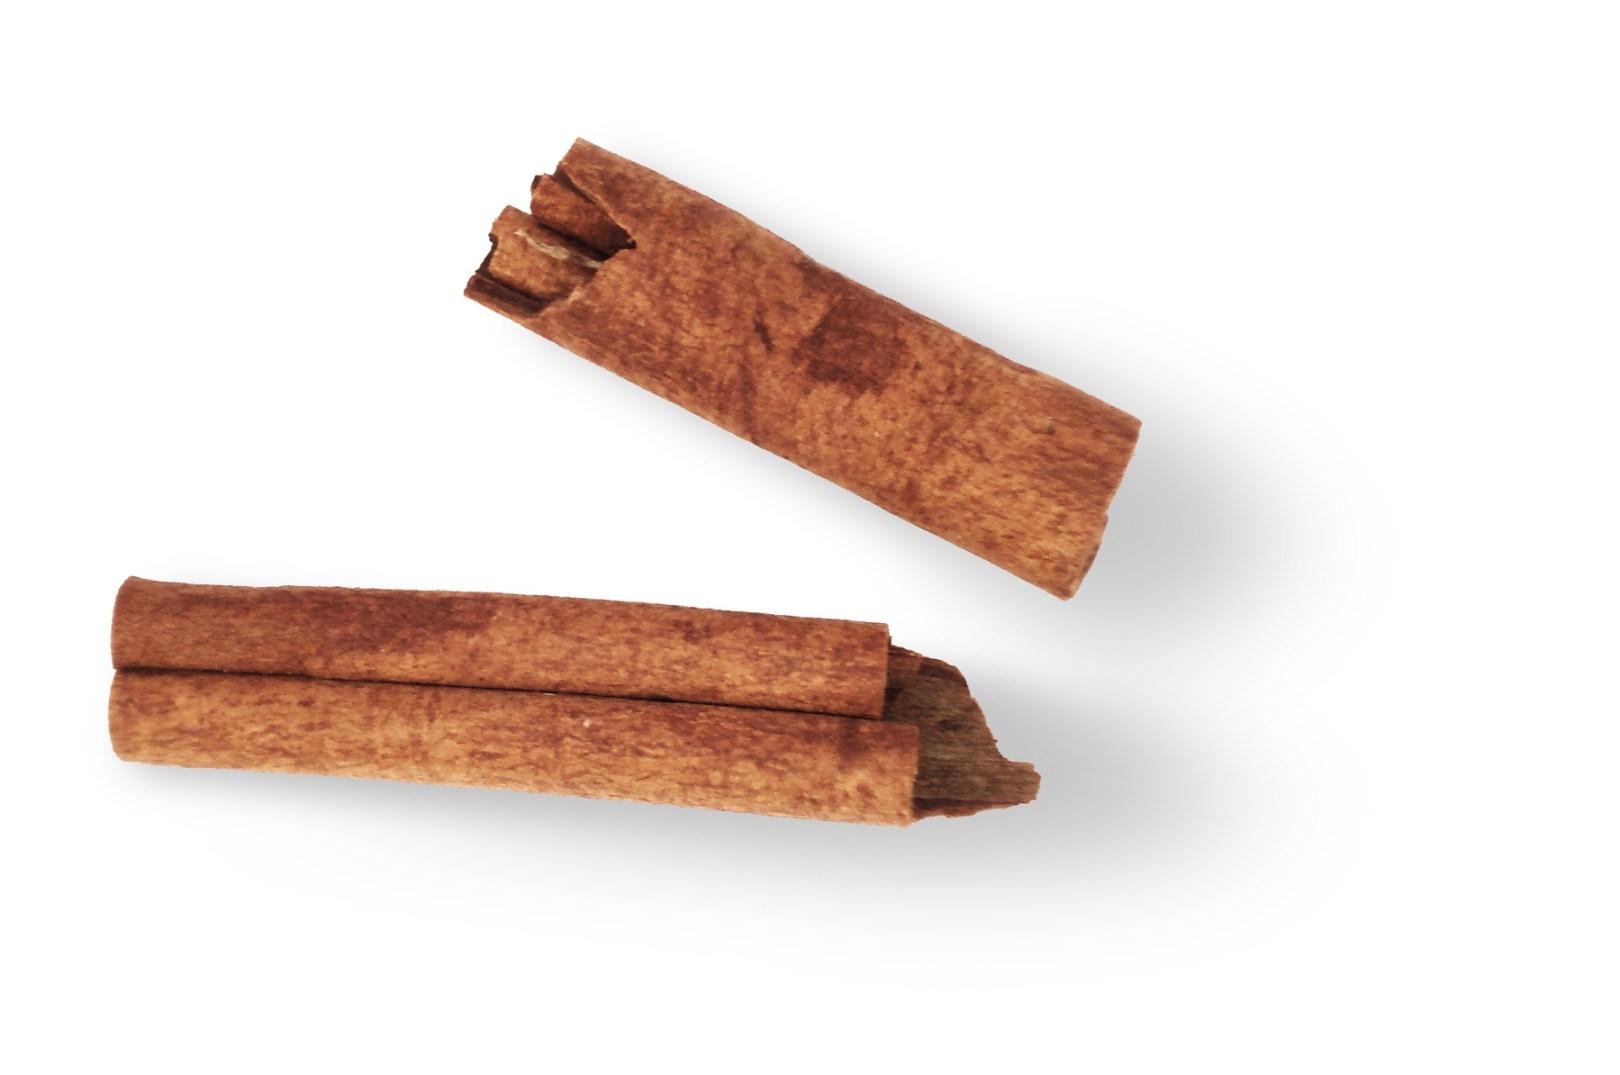 cinnamon-sticks-1319825